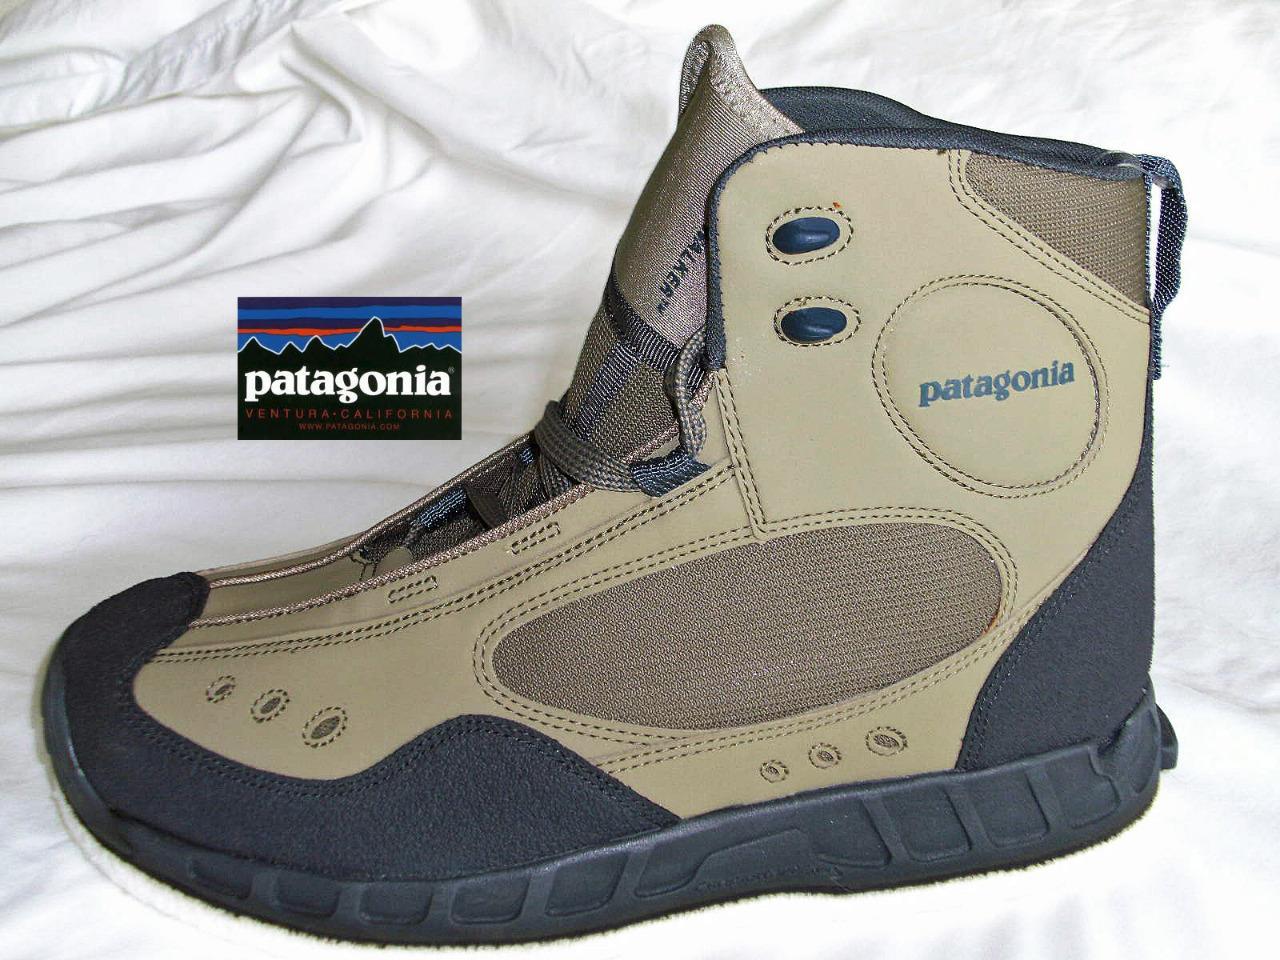 Patagonia Riverwalker Felt Sole Wading Shoes Boots Size 7 Flymasters Ebay